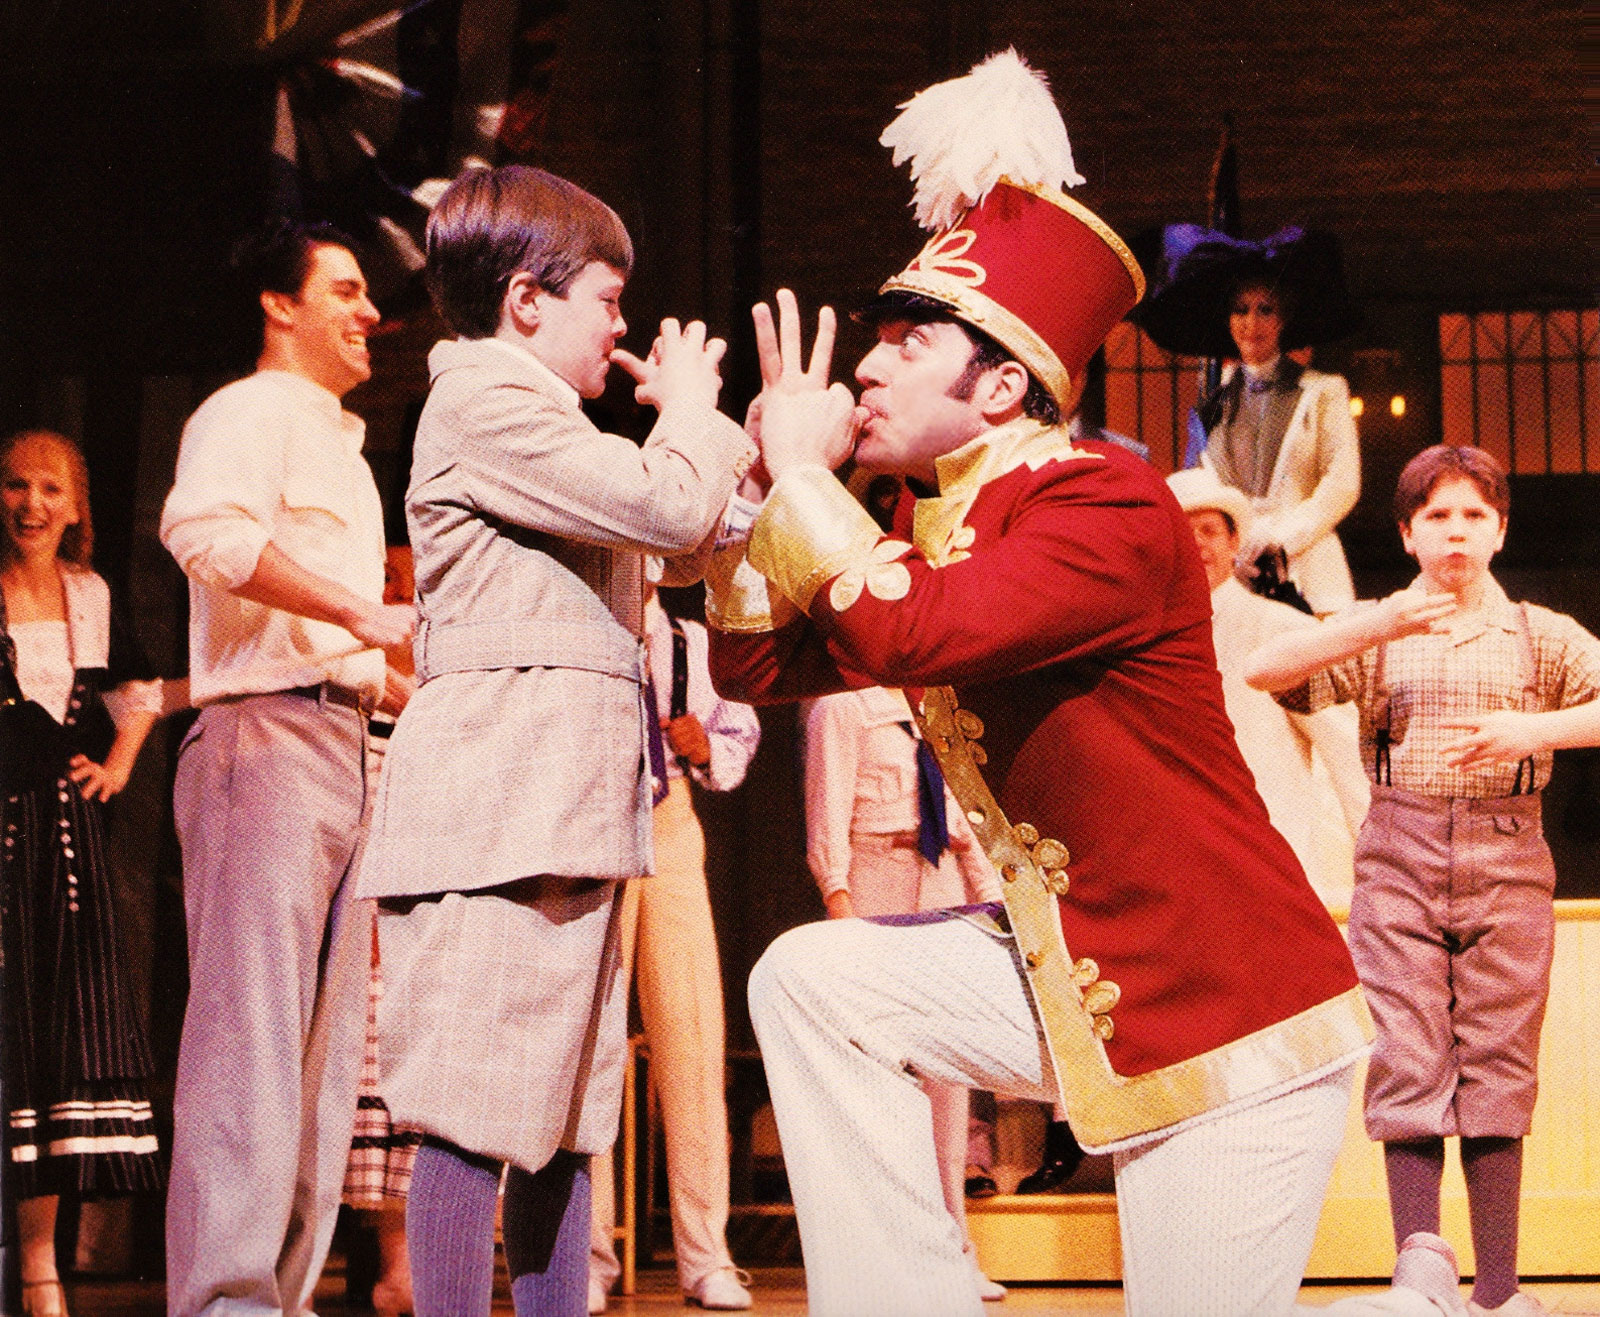 Harold Hill (Craig Bierko)teaching Winthrop (Michael Phelan) how to play the cornet.